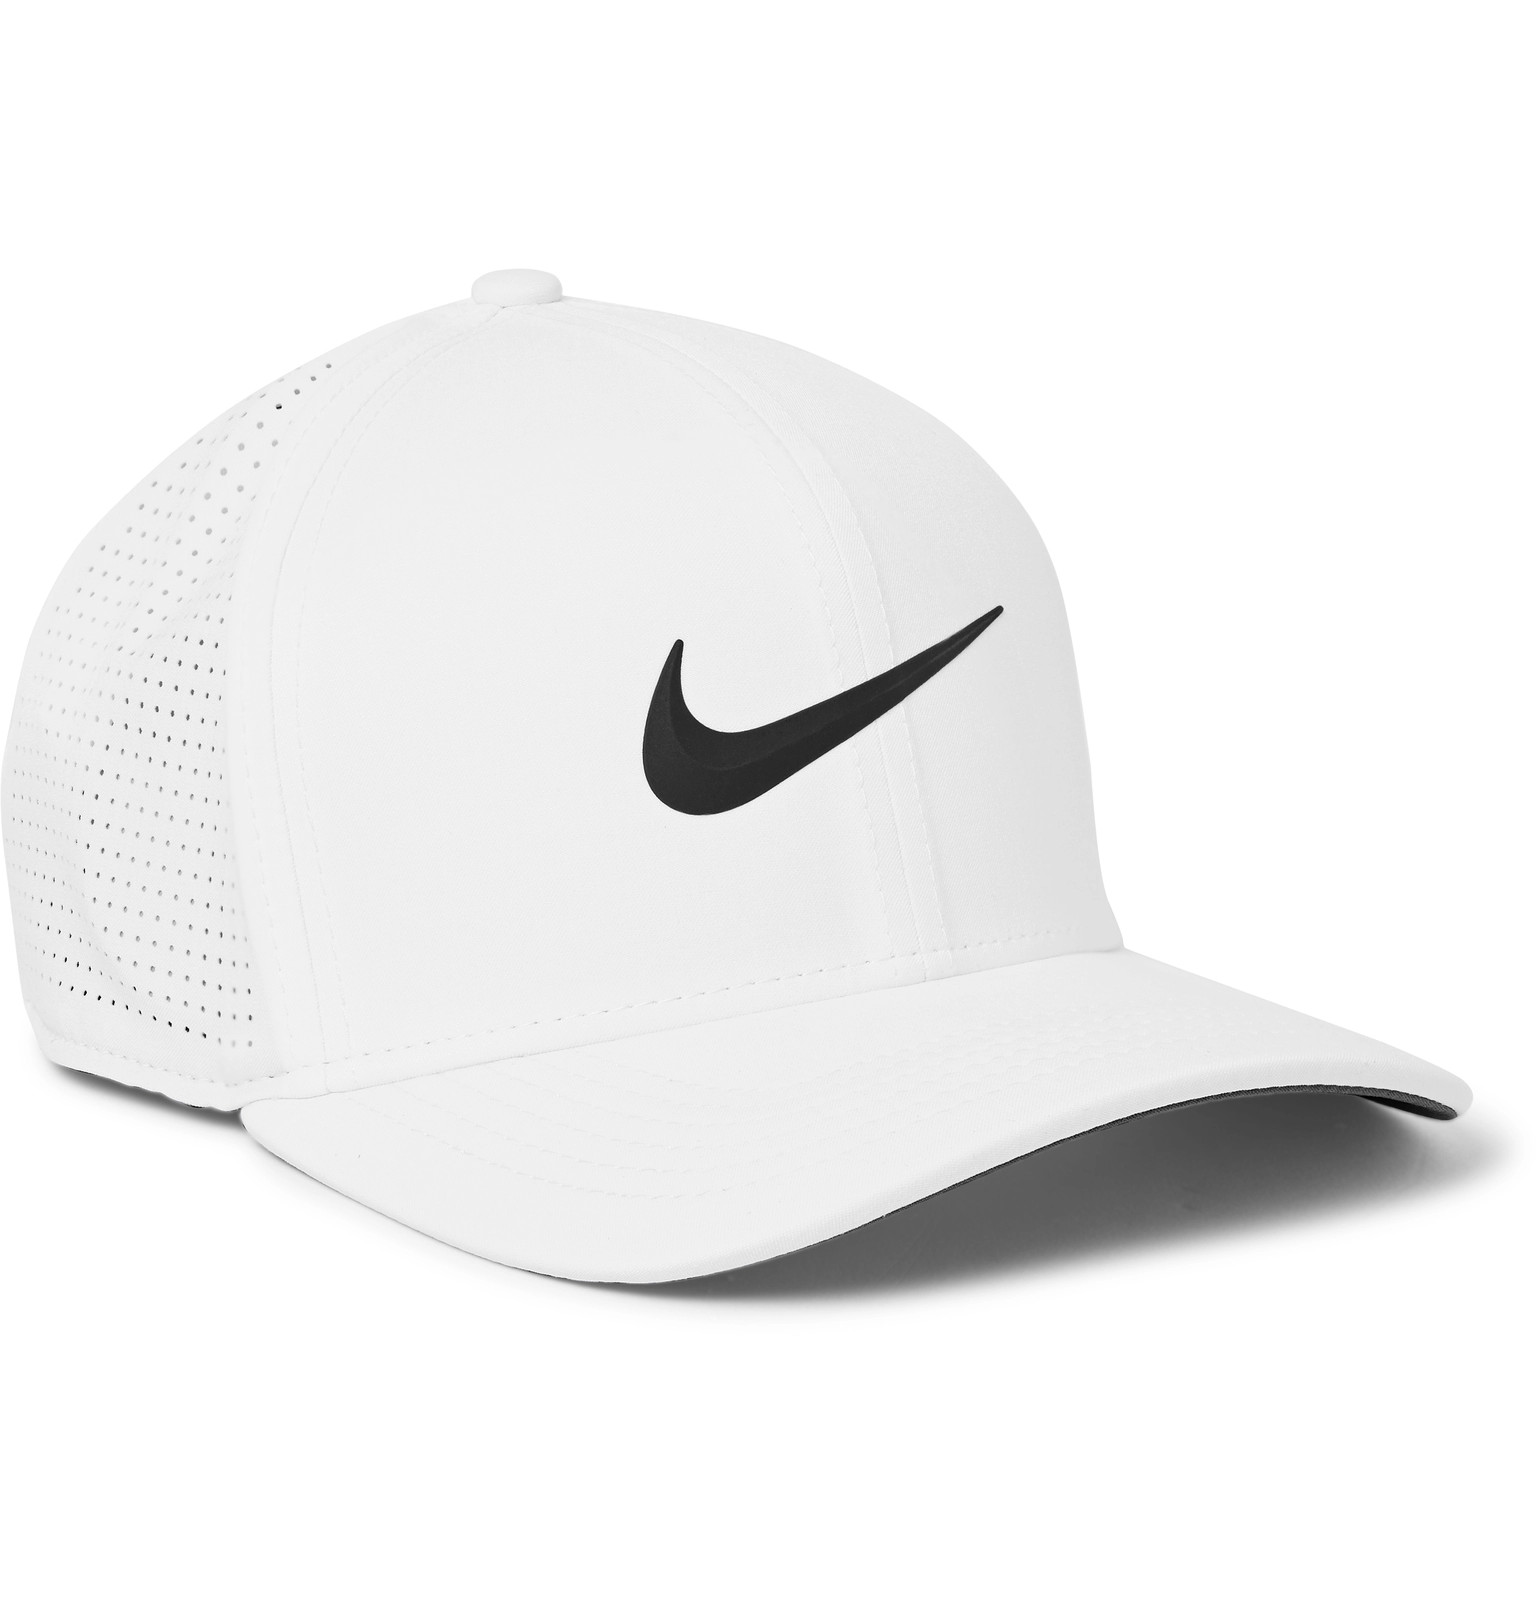 Nike Golf - Aerobill Classic 99 Perforated Dri-FIT Golf Cap 4db312ba6a3